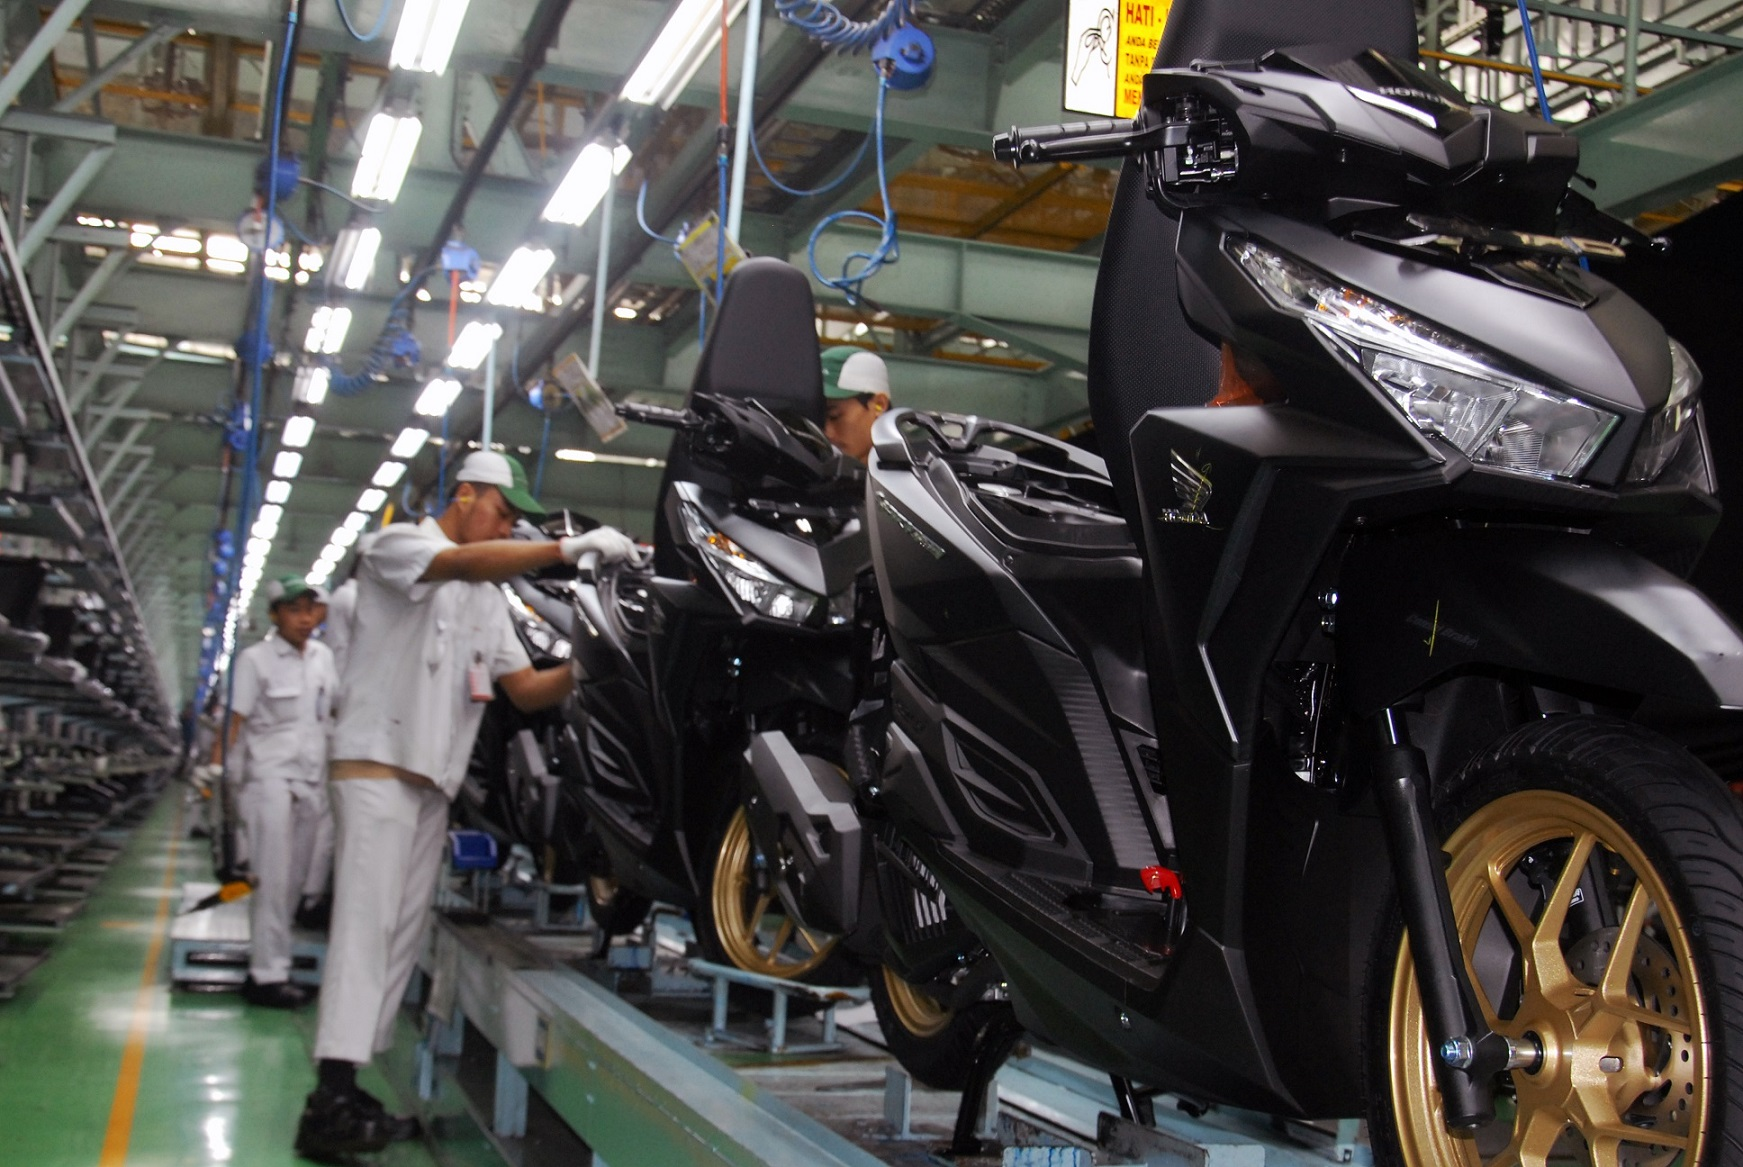 Laman 166 Info Otomotif Yang Anda Cari Ada Di Sini All New Cbr 150r Slick Black White Jakarta Ahm